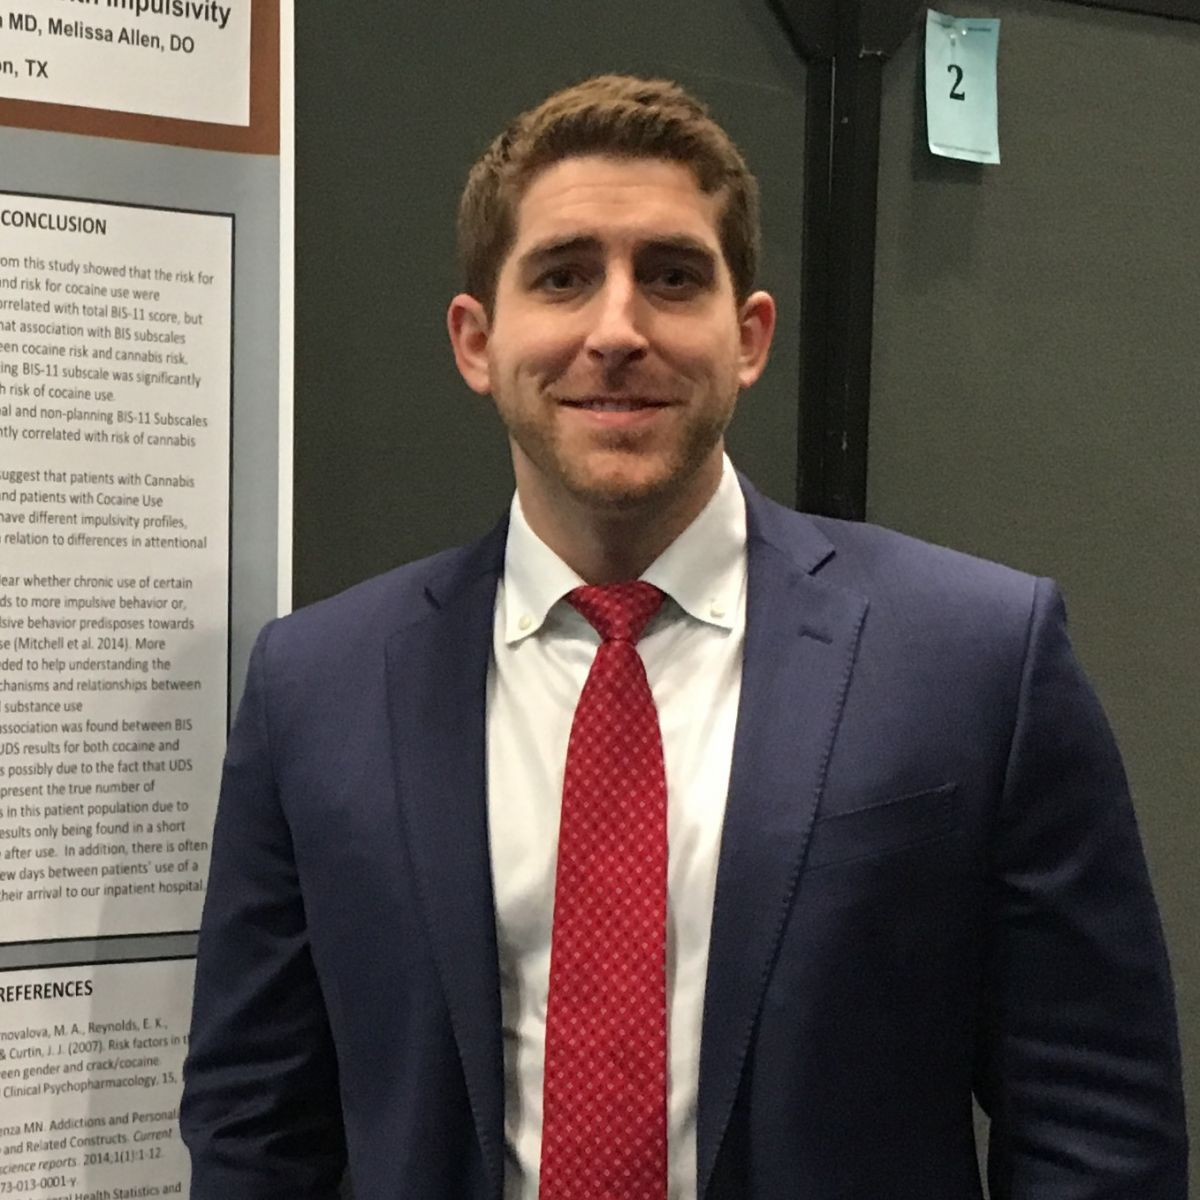 Gregory Larimer, MD, UT Health Medical School